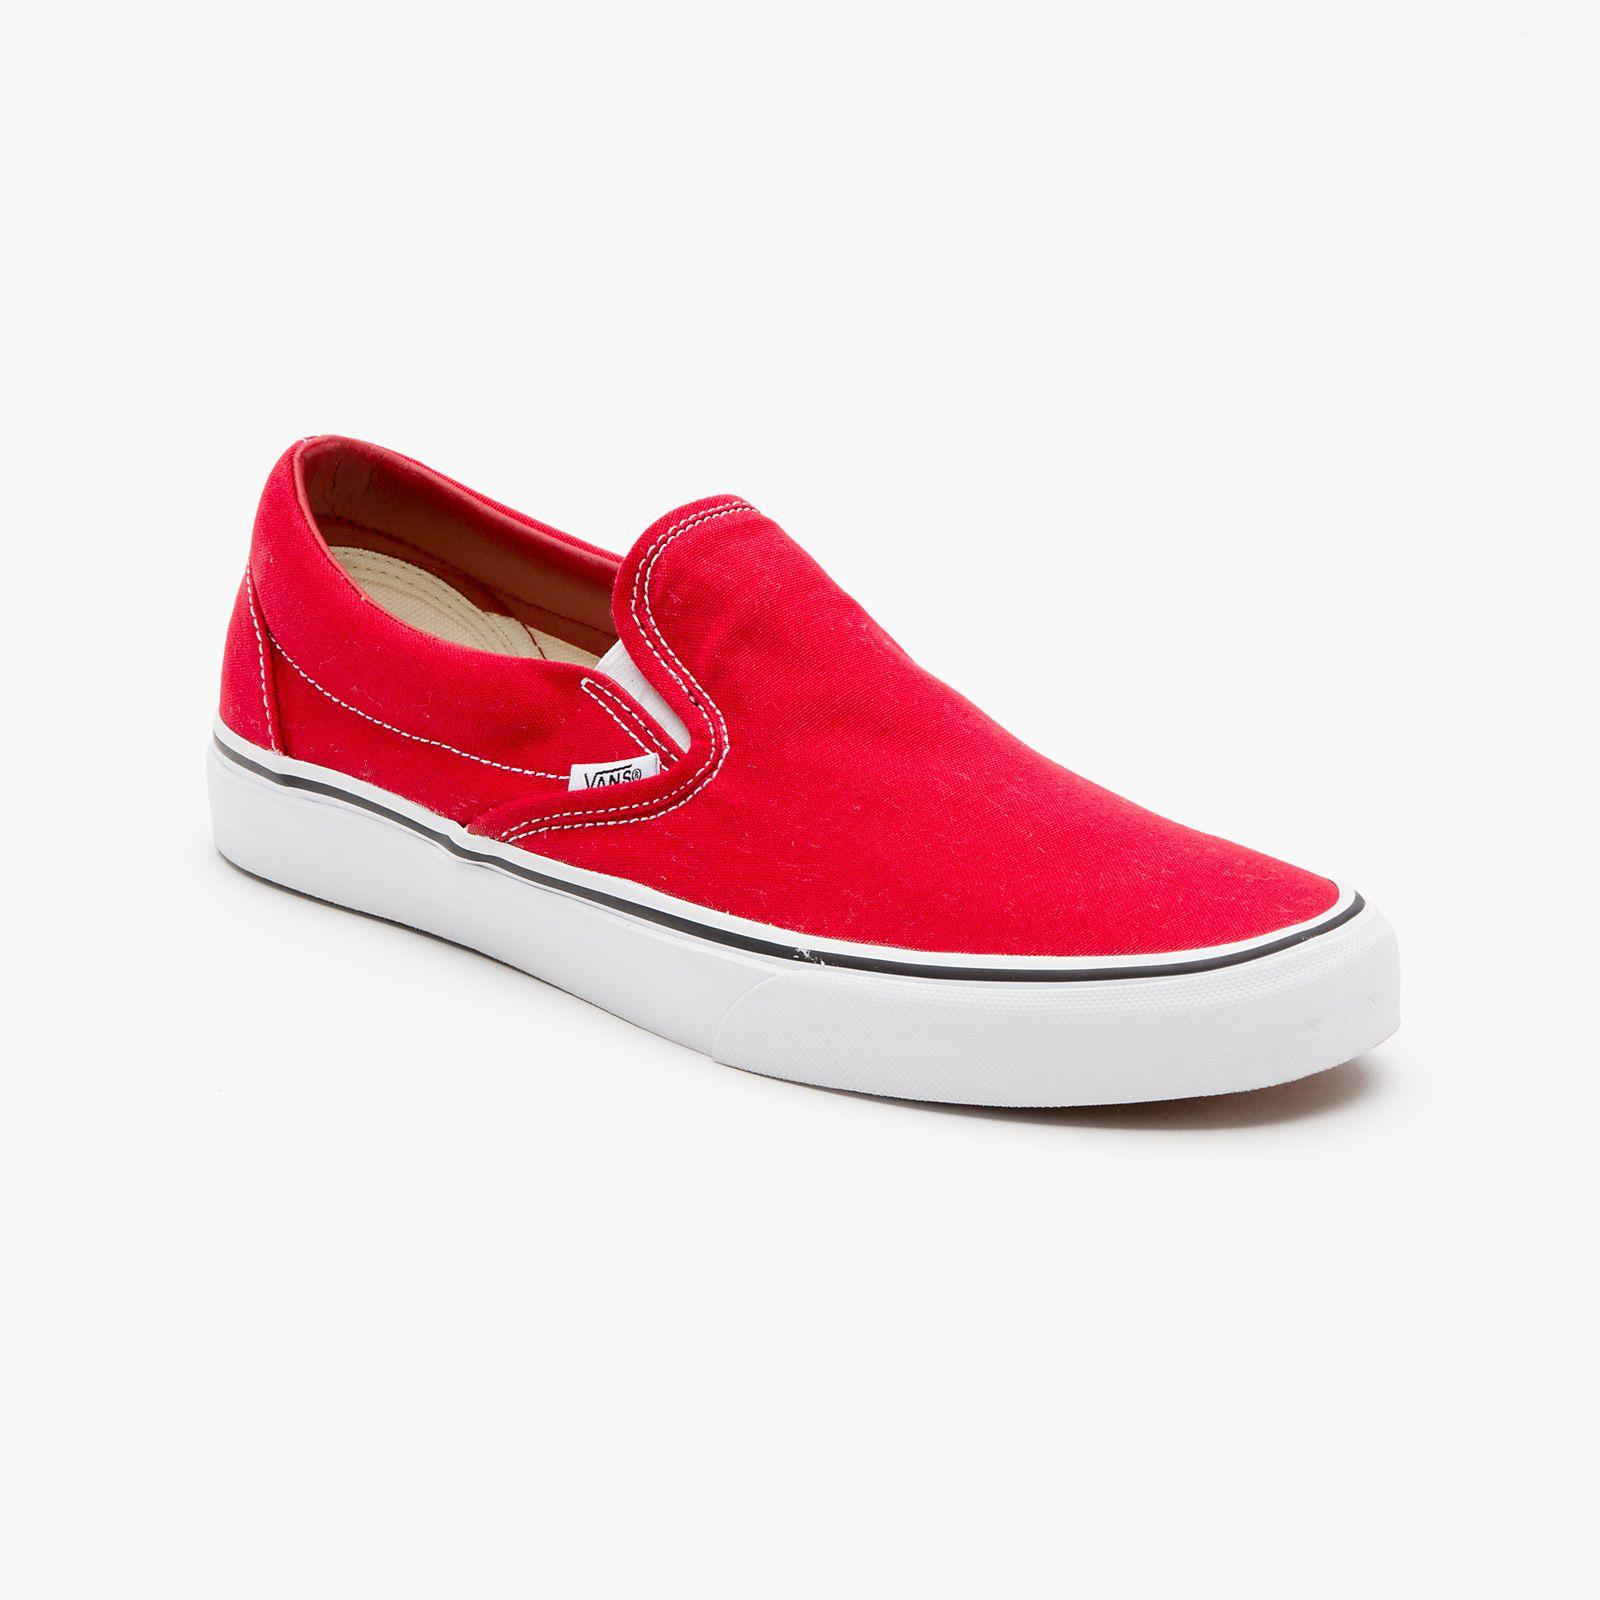 Vans, Beautiful sneakers